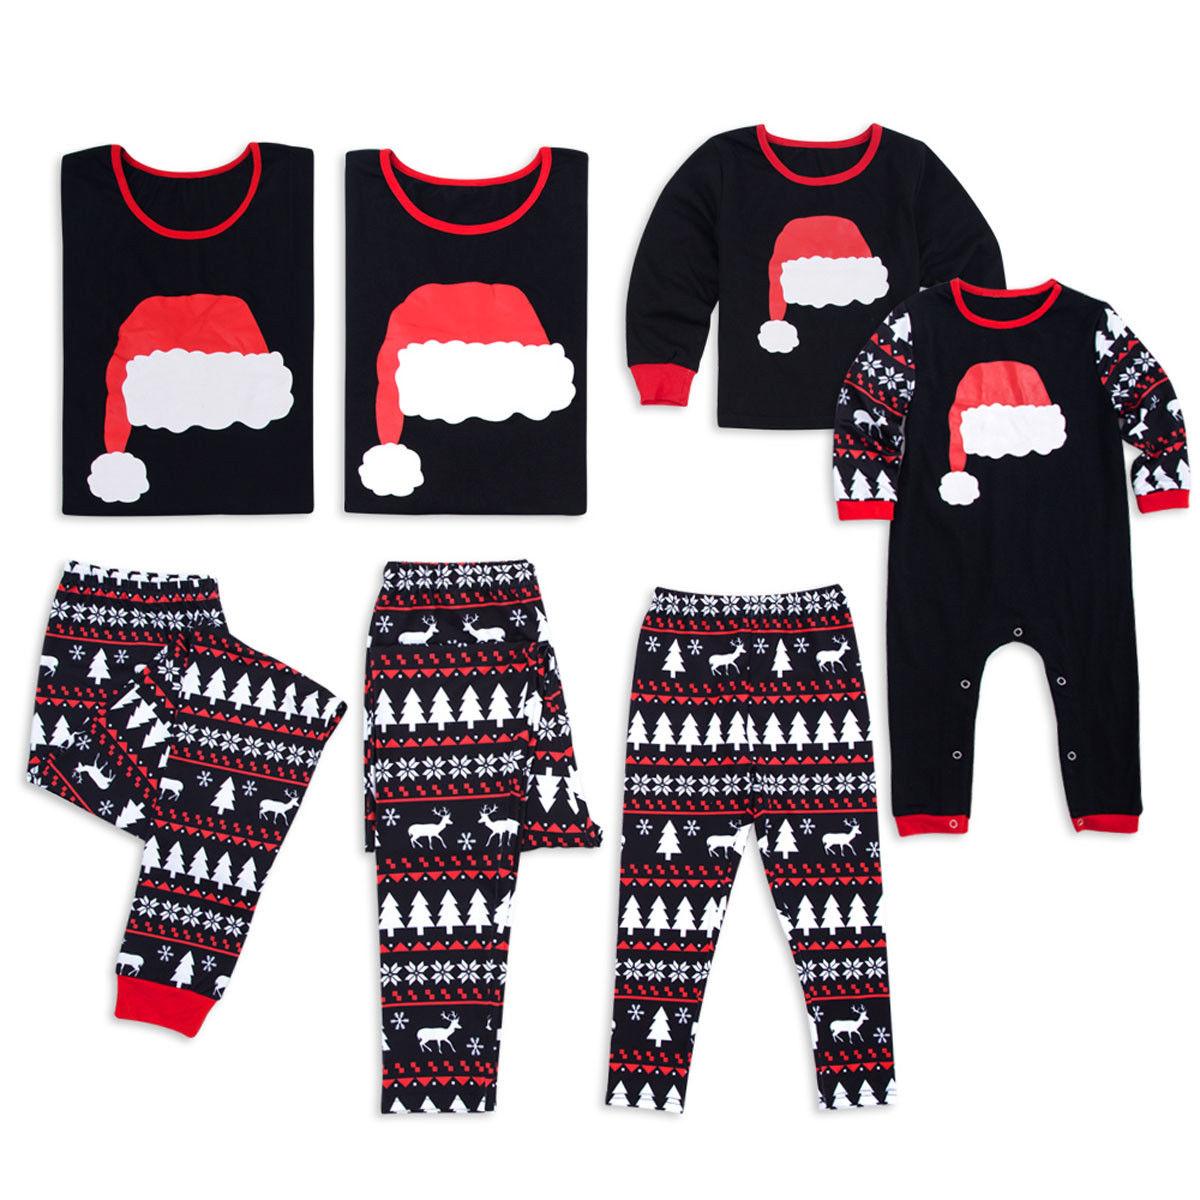 2018 Family Matching Kids Womens Christmas Pajamas Sets Xmas Long Sleeves Sleepwear Nightwear Warm Set